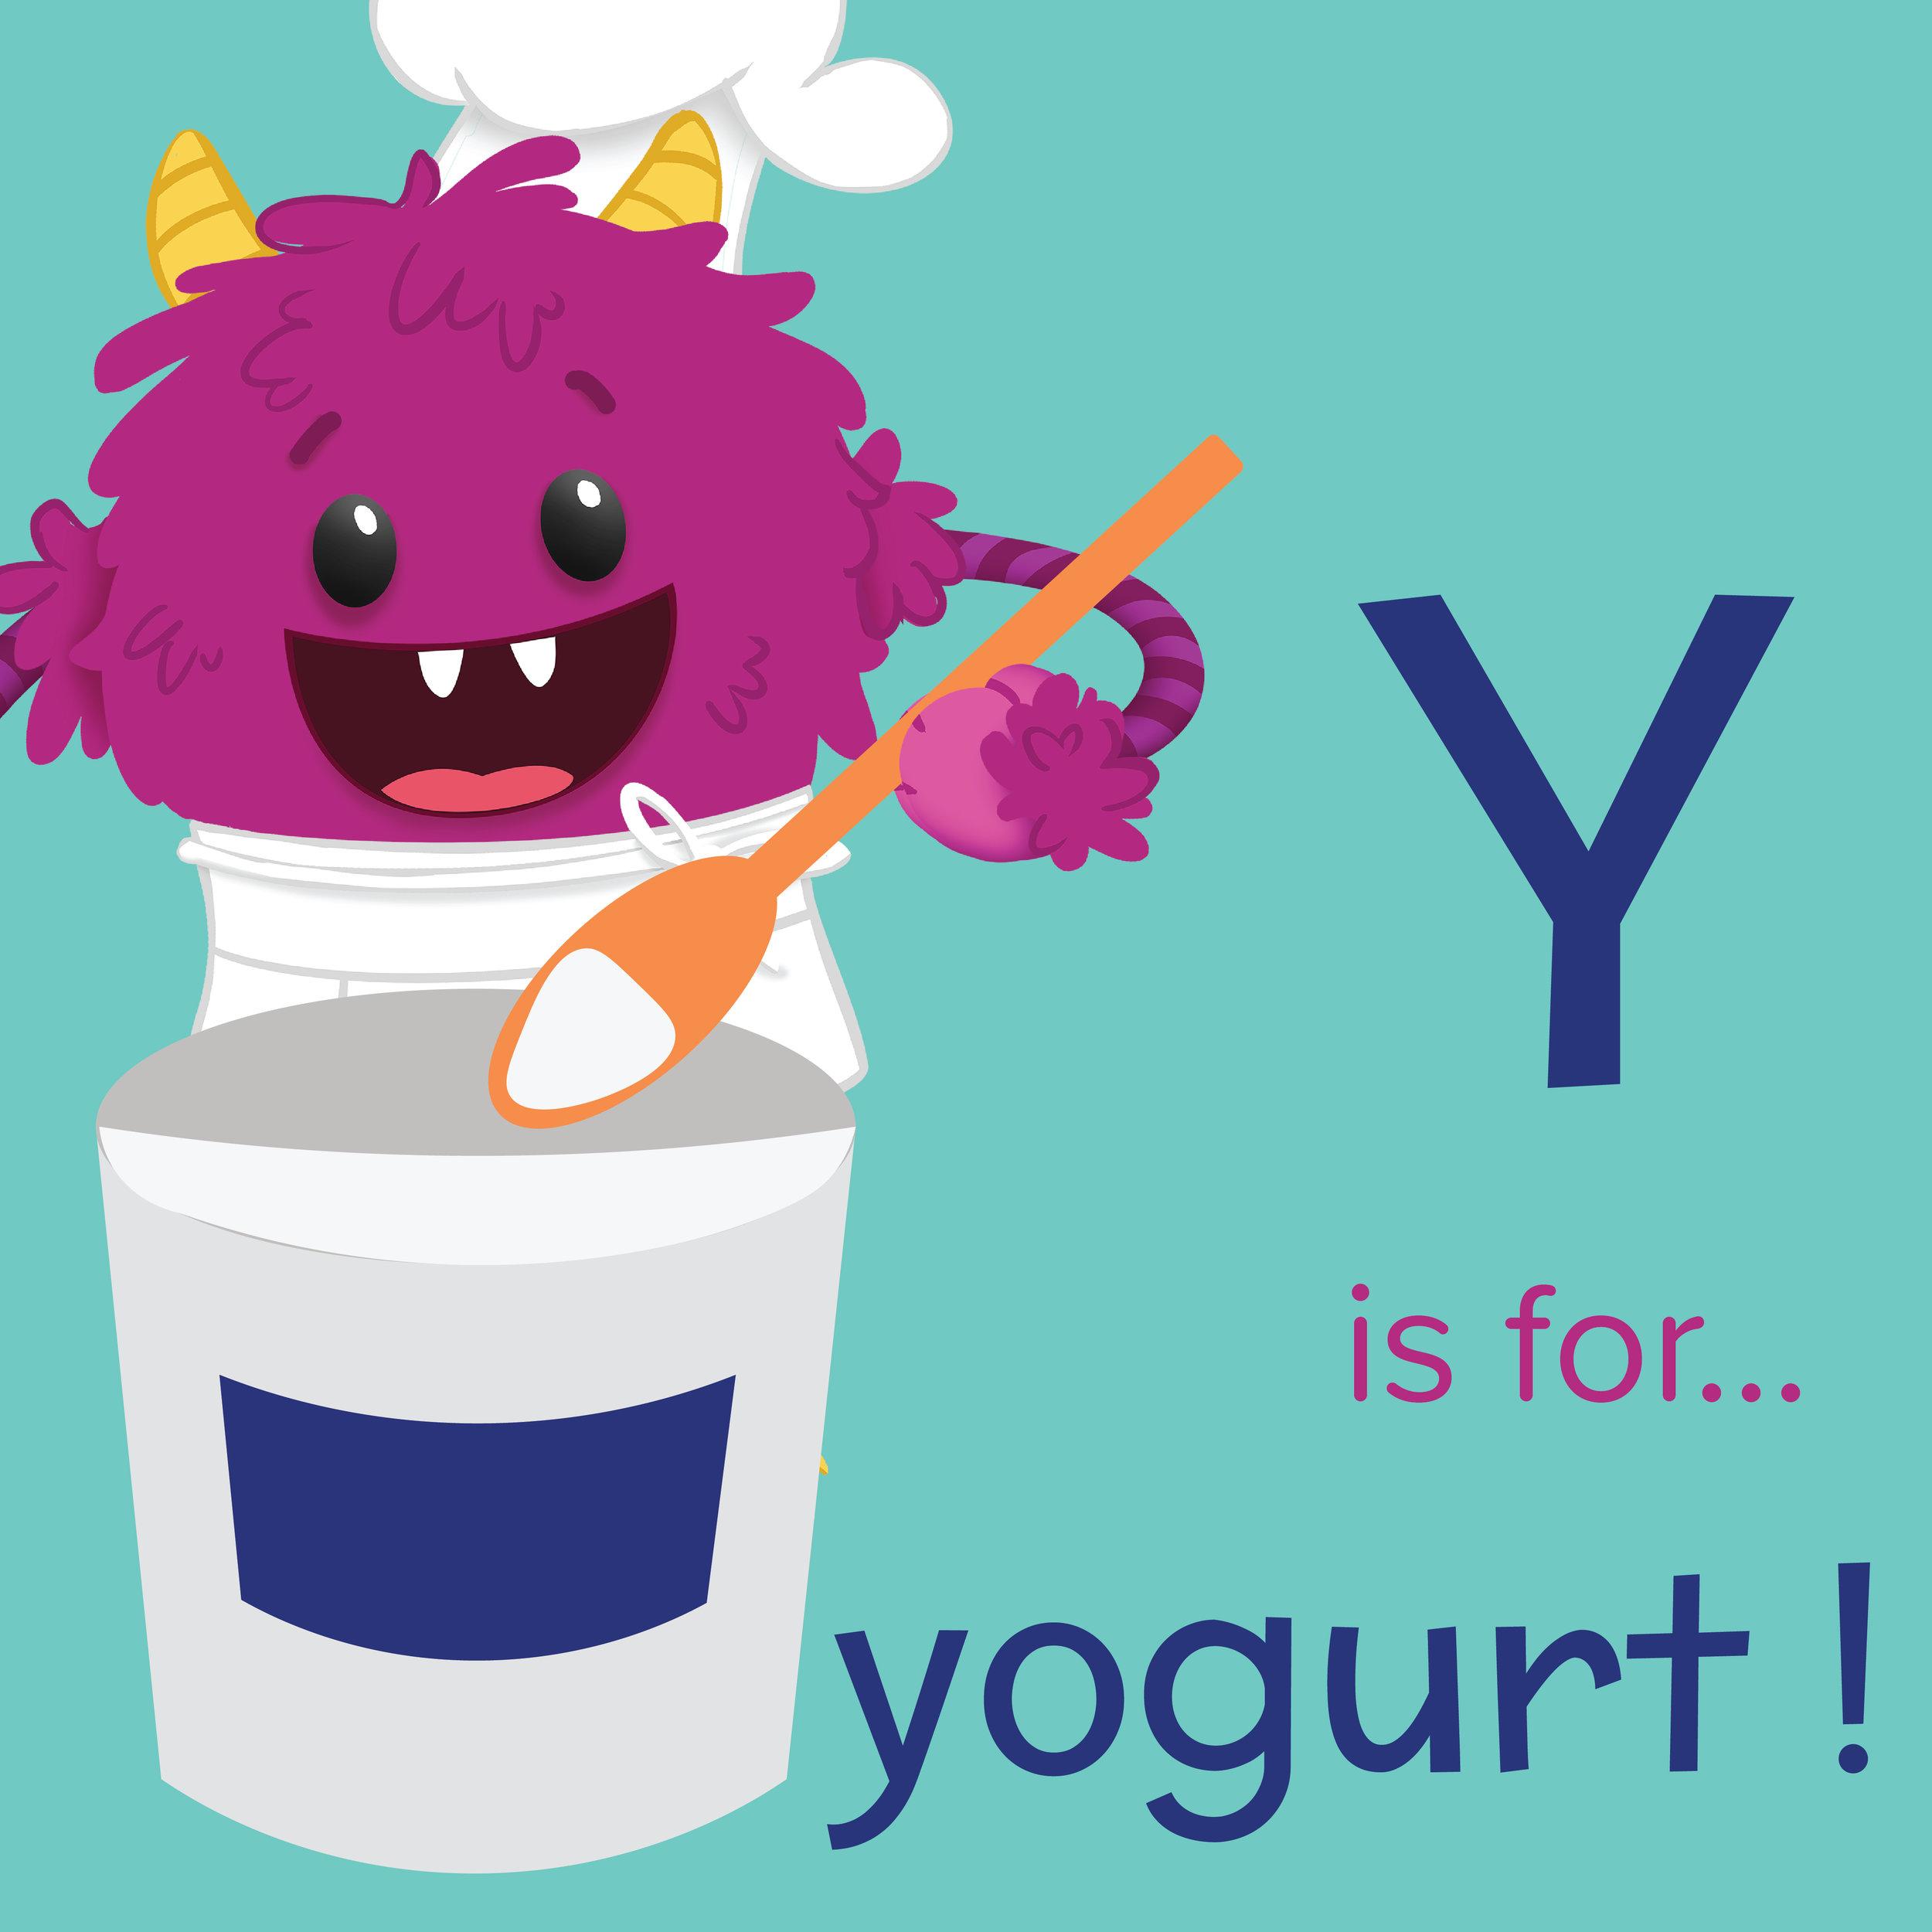 yogurt-ranch-dip-nomster-chef